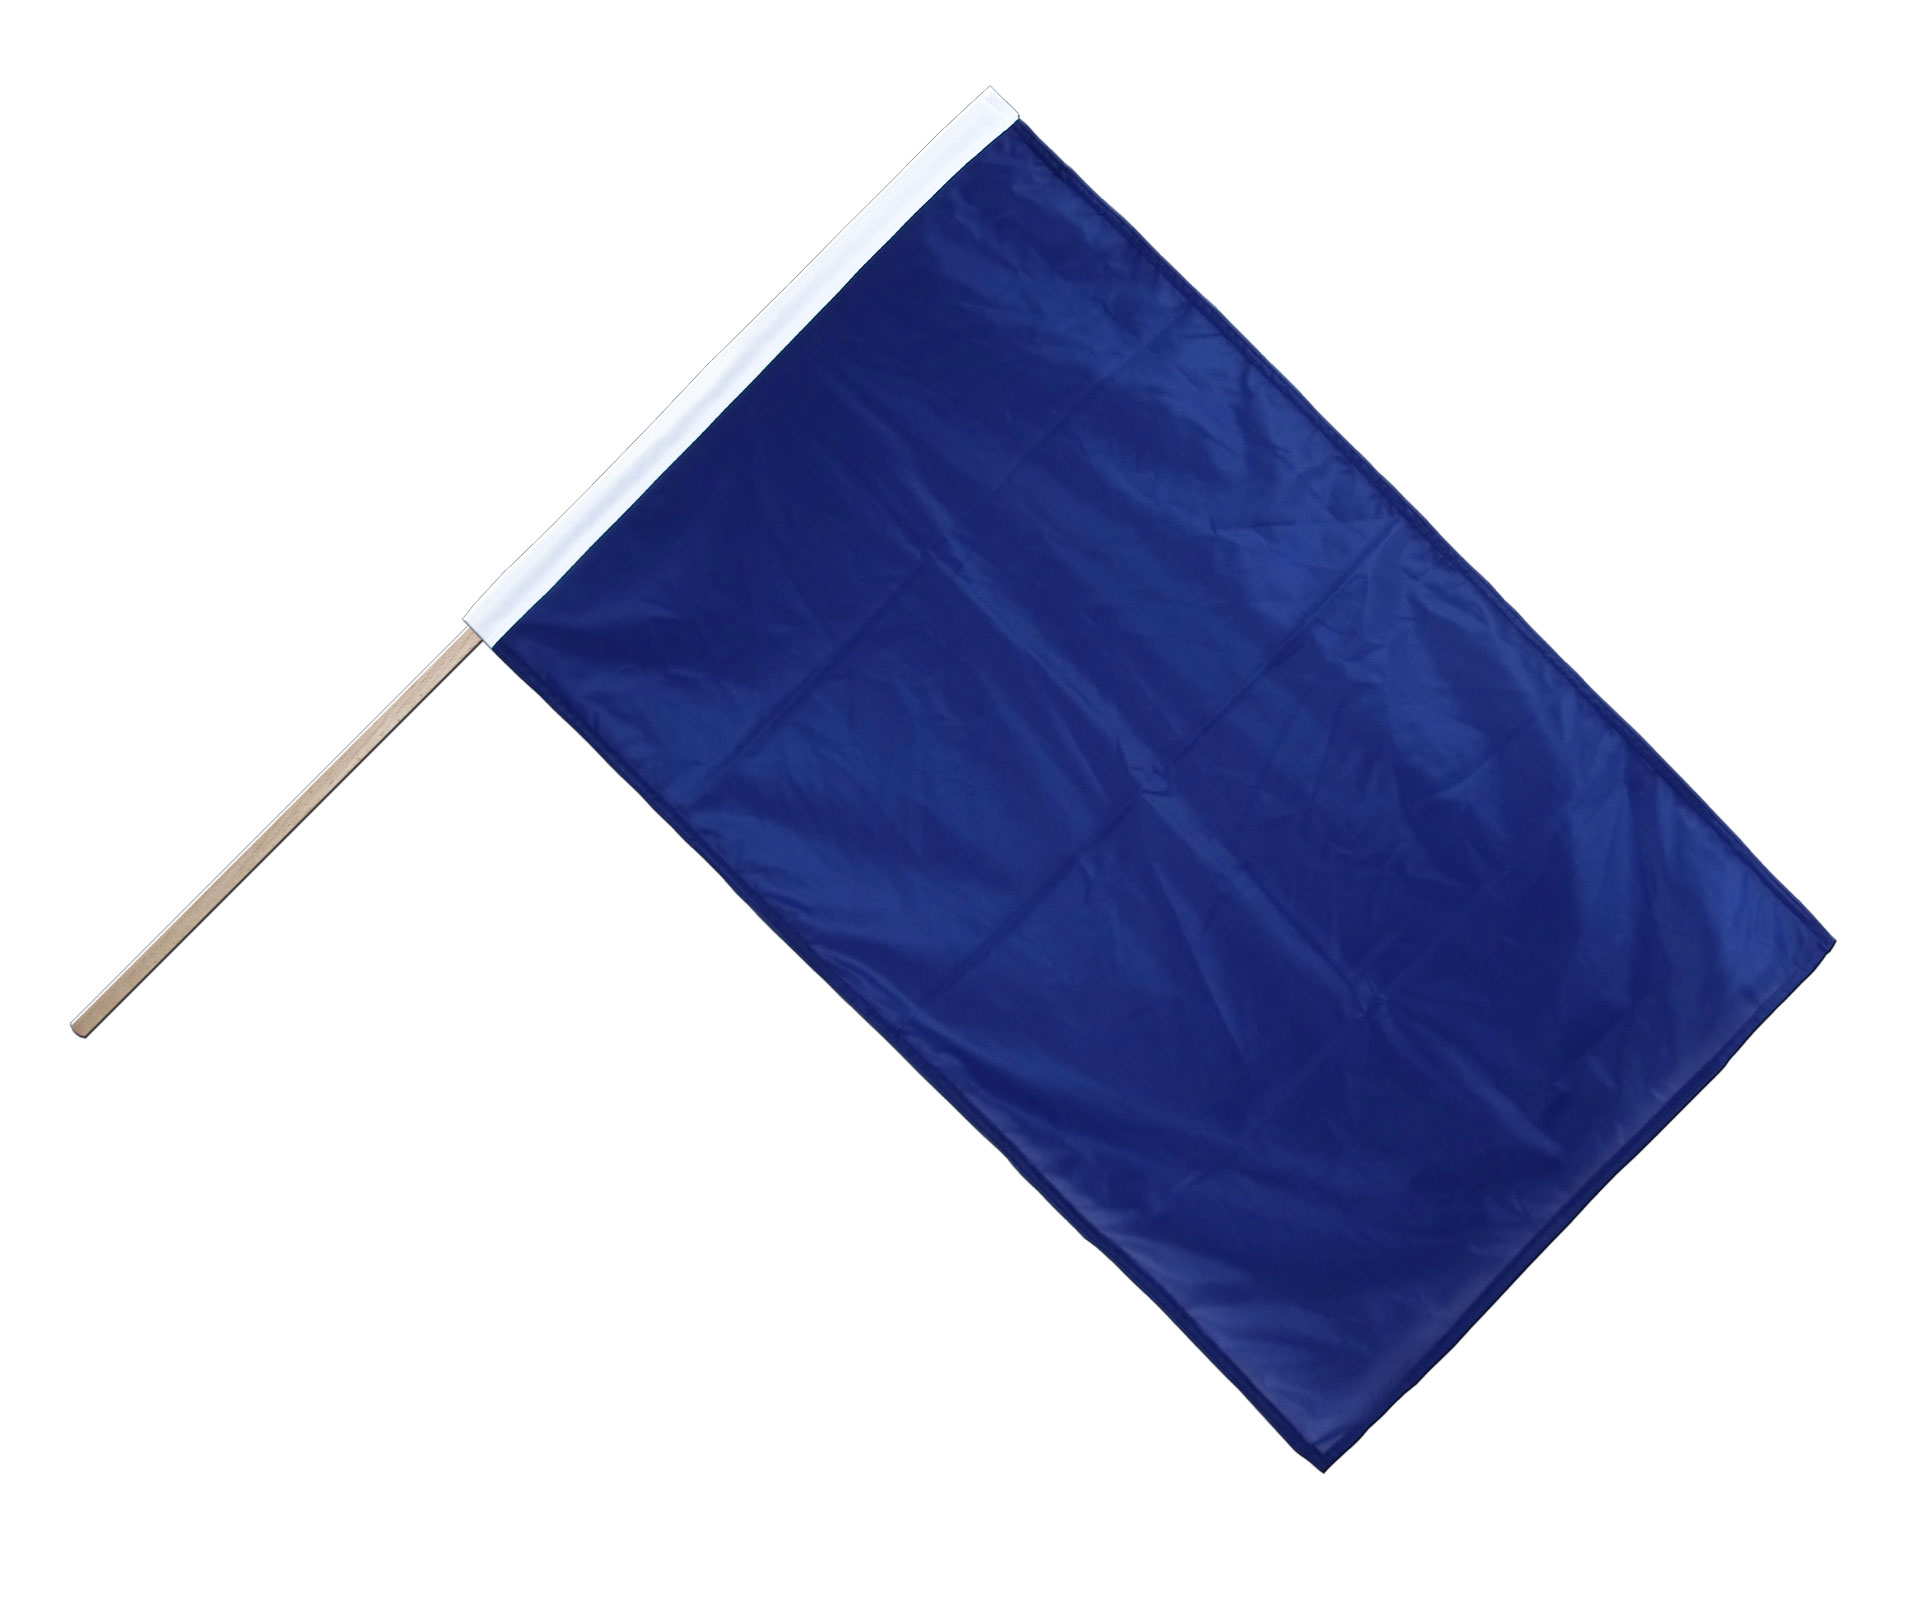 Stockflagge PRO Einfarbig Blaue Fahne, Blaue